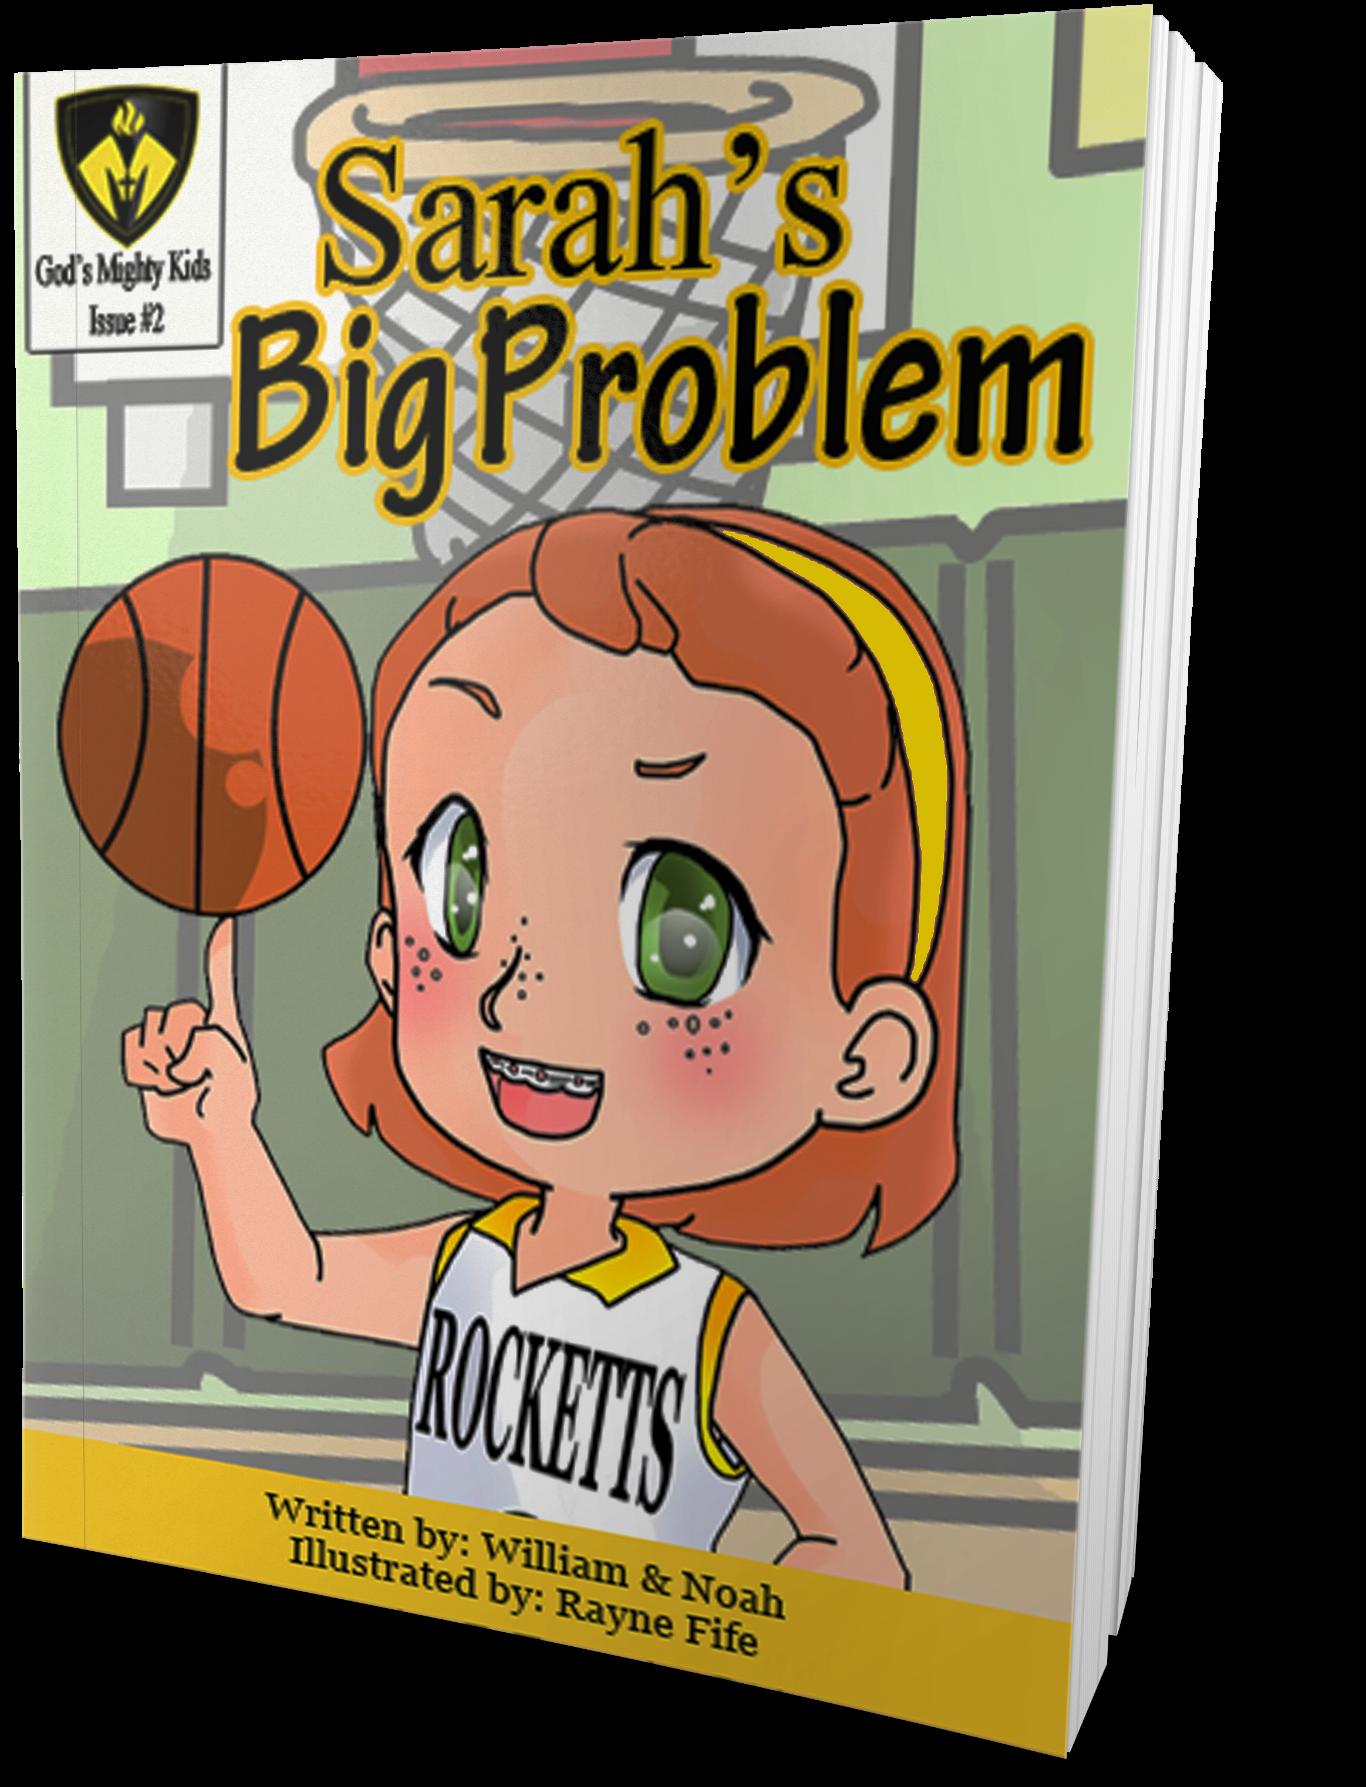 Sarah's Big Problem